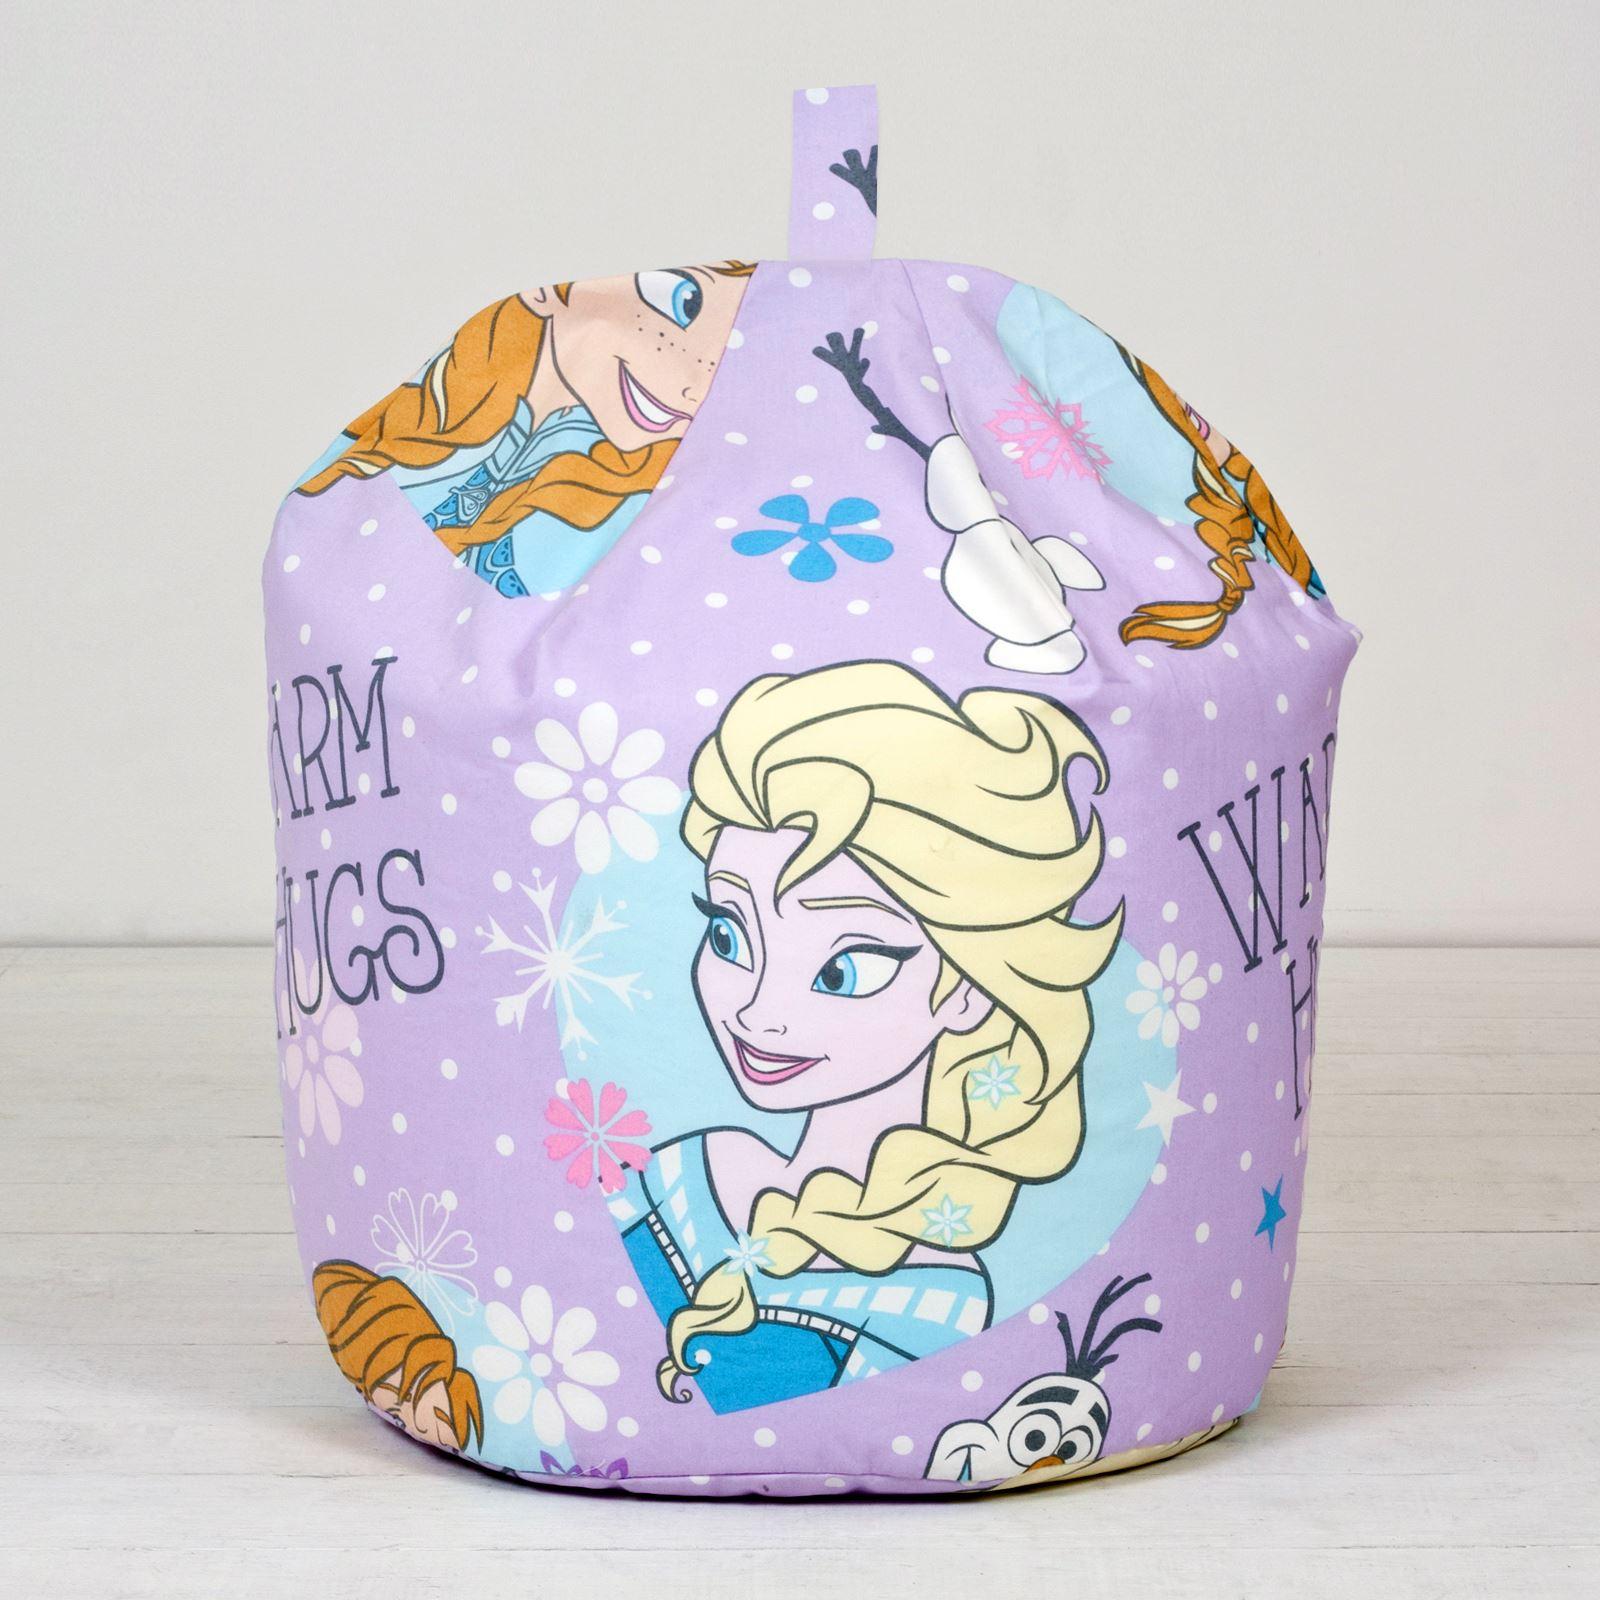 Disney-Frozen-Elsa-Anna-Olaf-Kids-Childrens-Girls-Purple-Bean-Bag-Refill-Cover